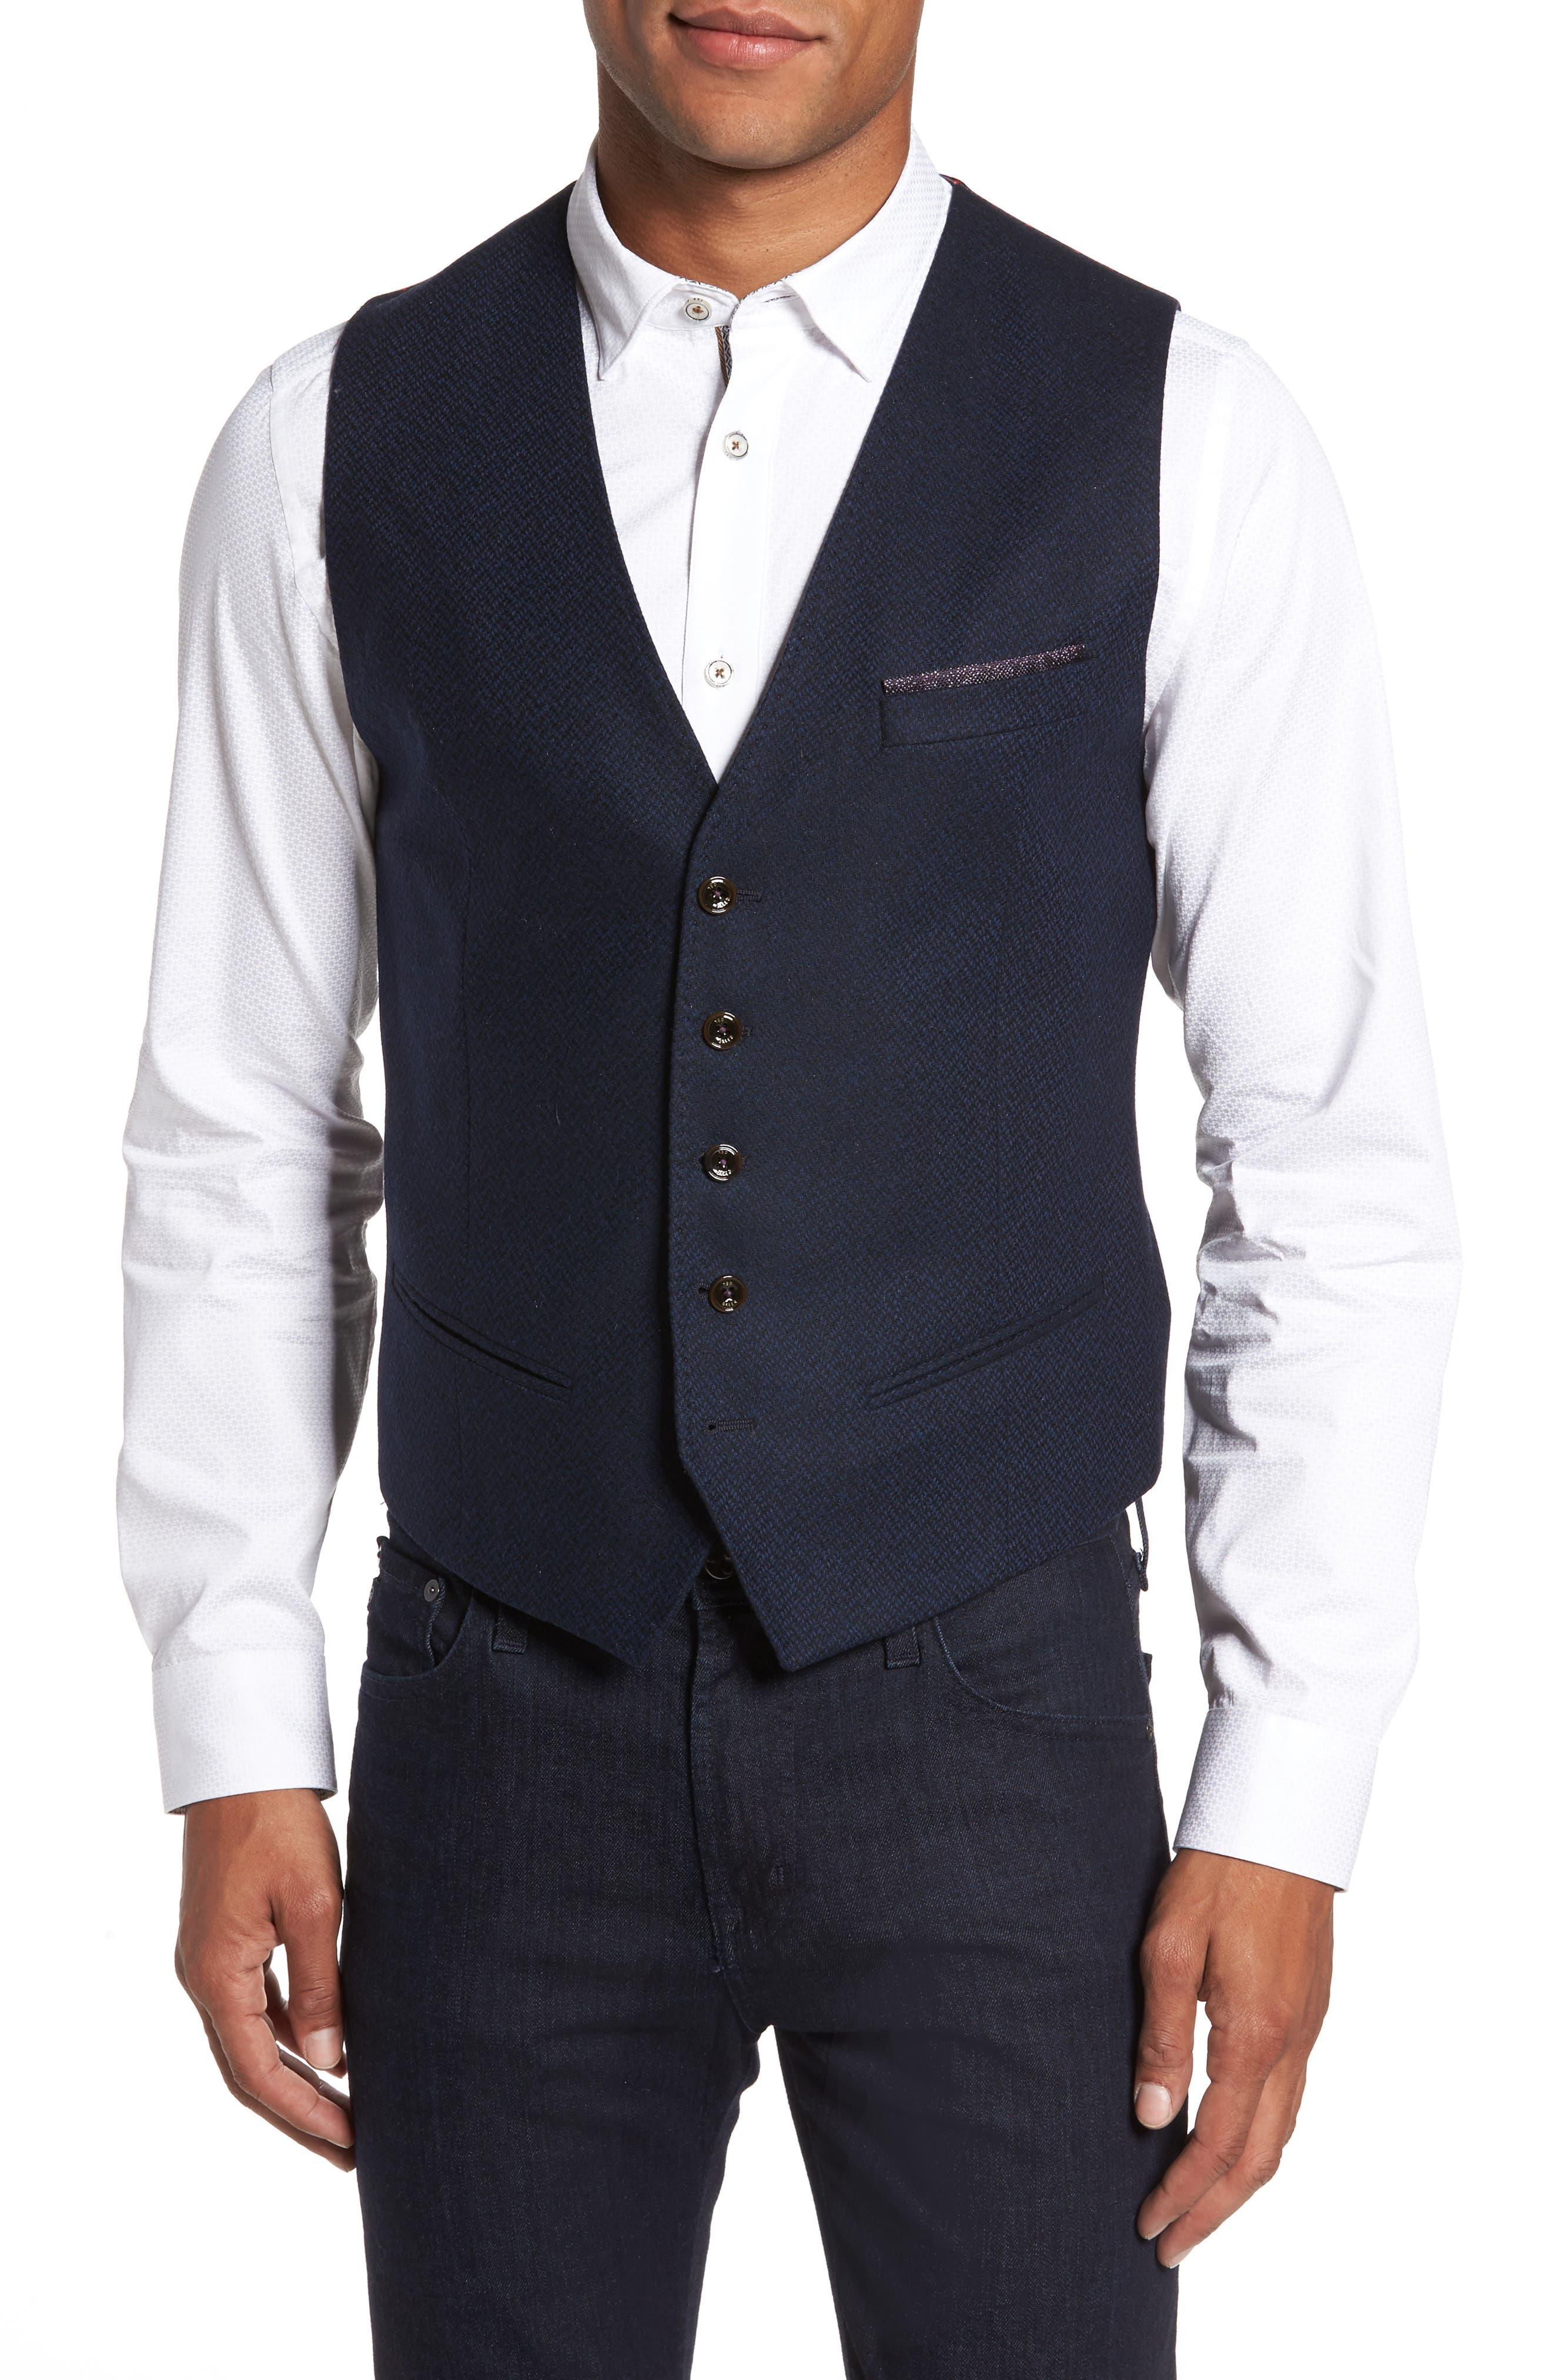 Alternate Image 1 Selected - Ted Baker London Waistcoat